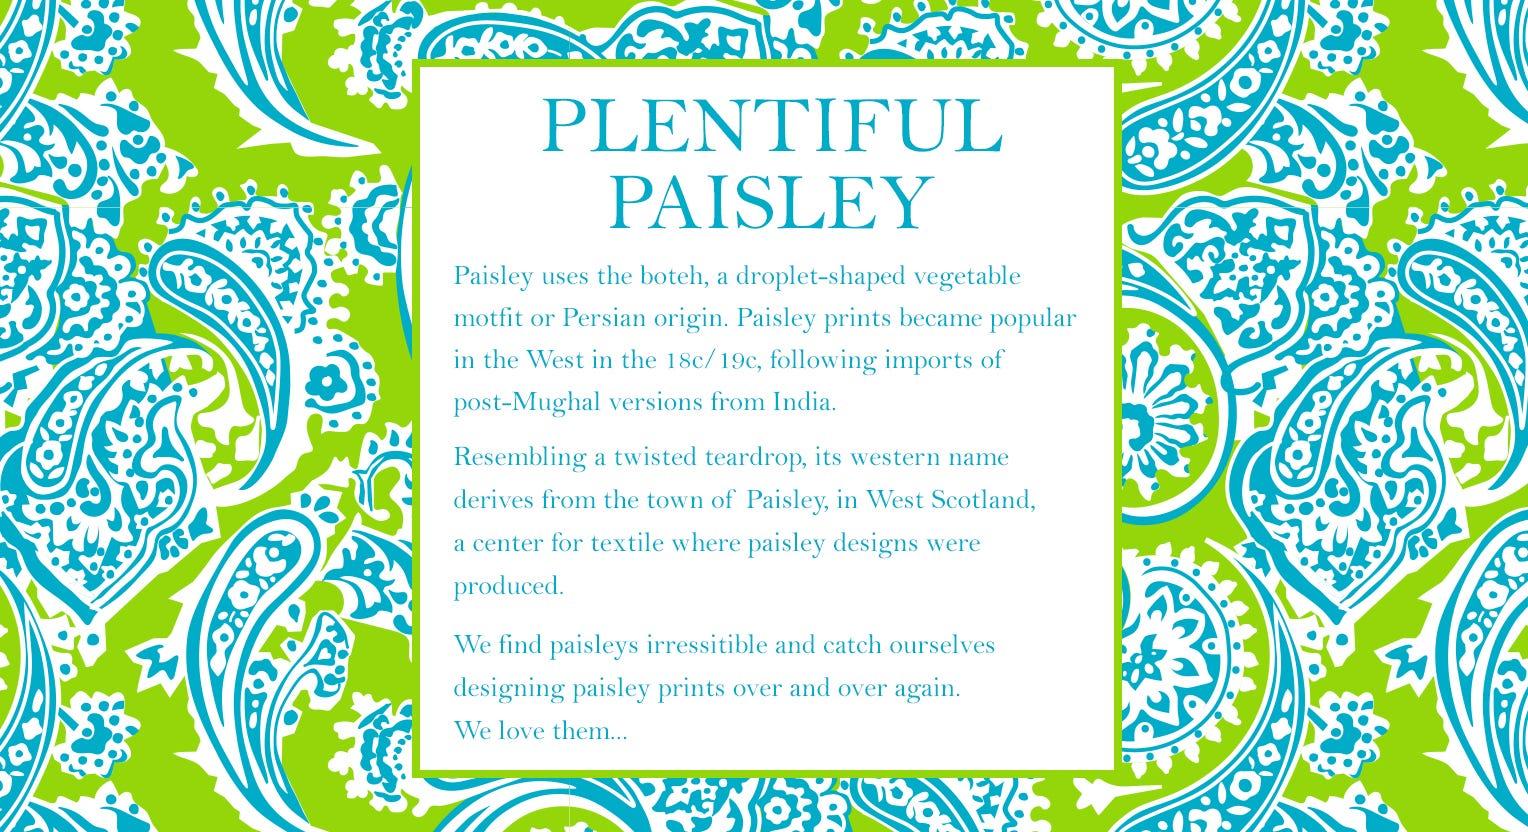 Plentiful Paisley